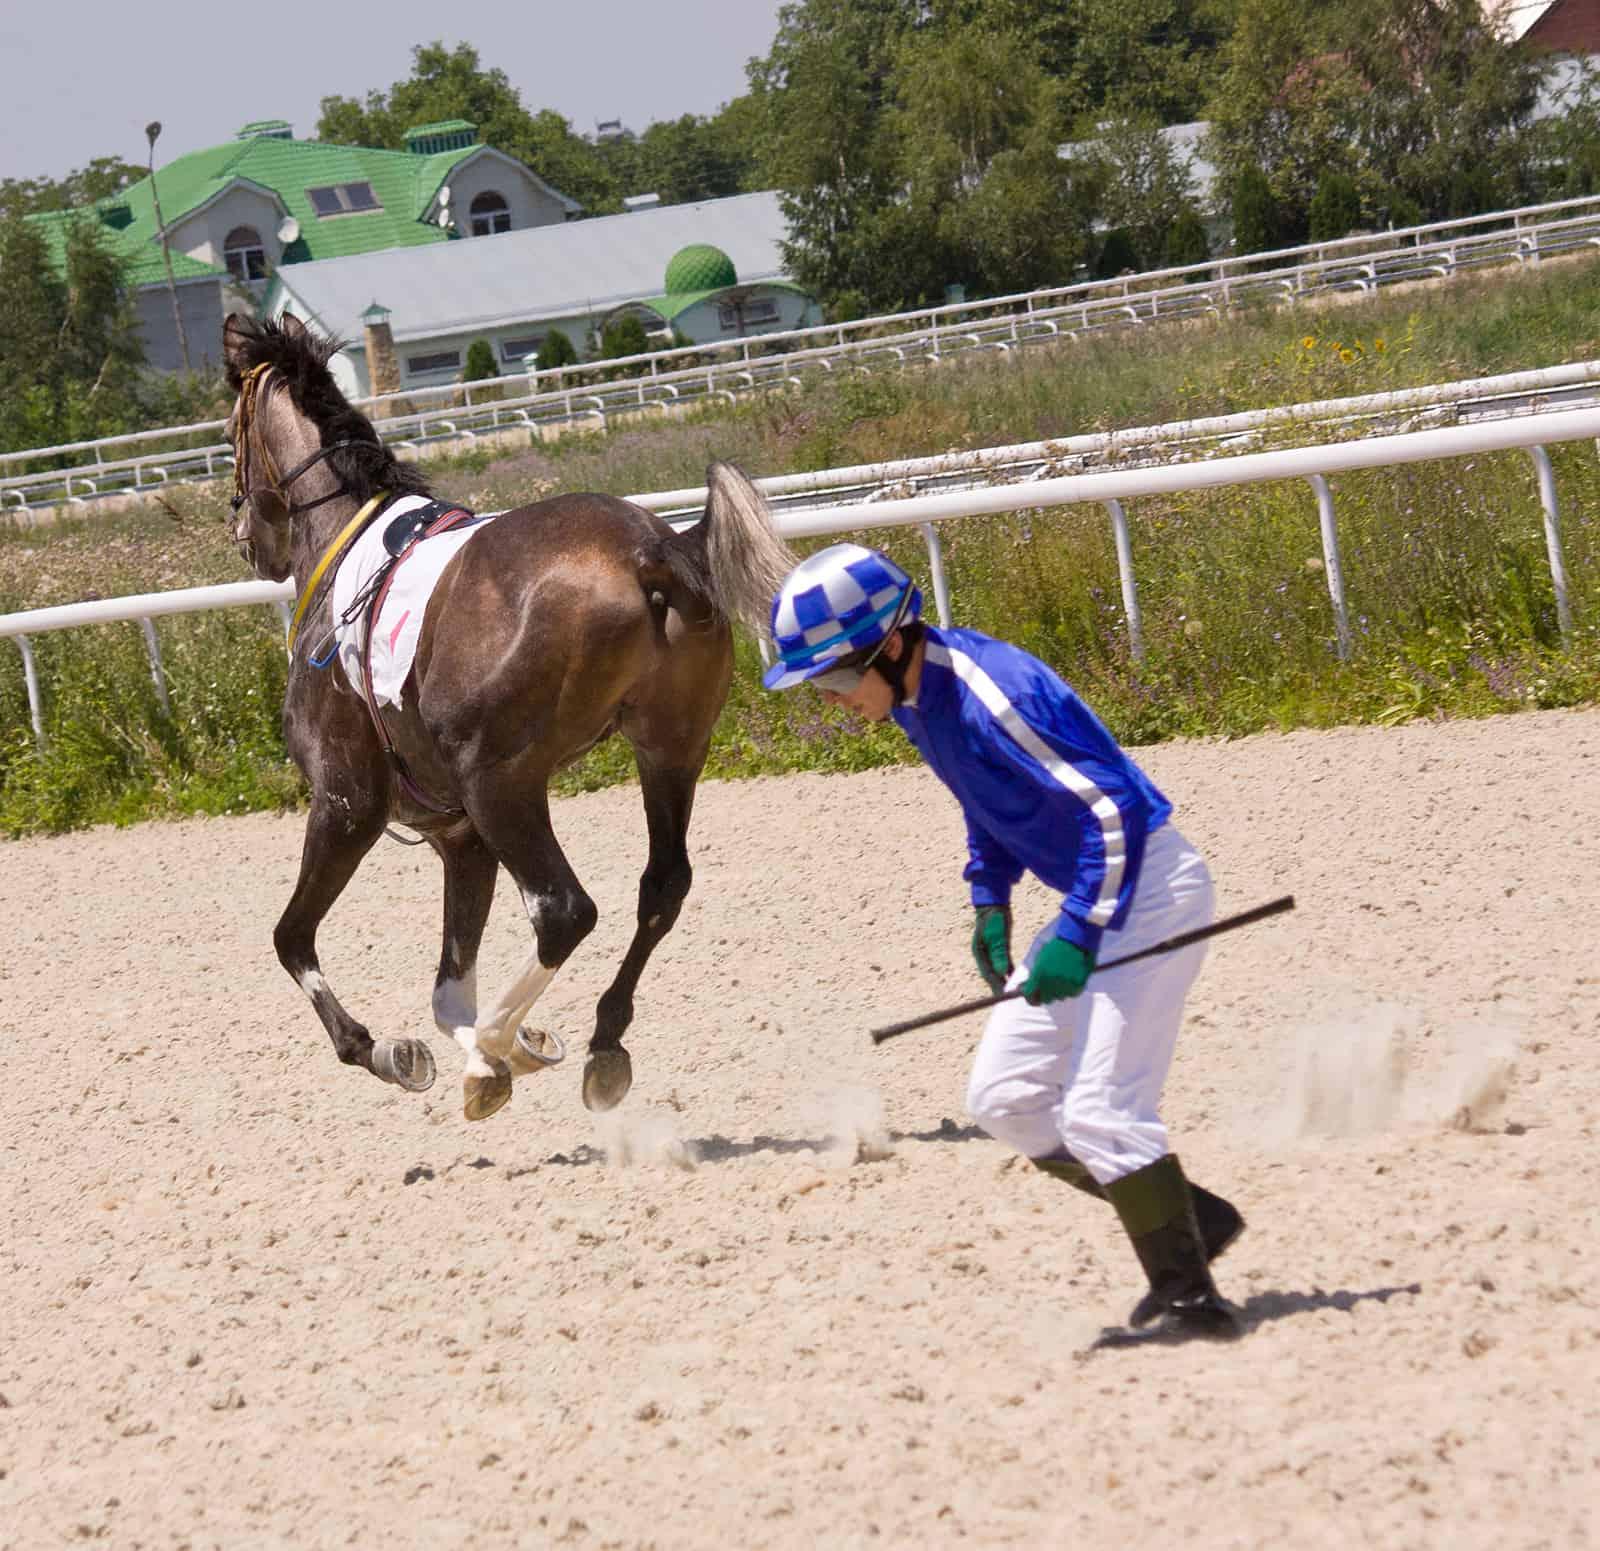 Jockey Injury Reporting at Maryland Thoroughbred Racetracks